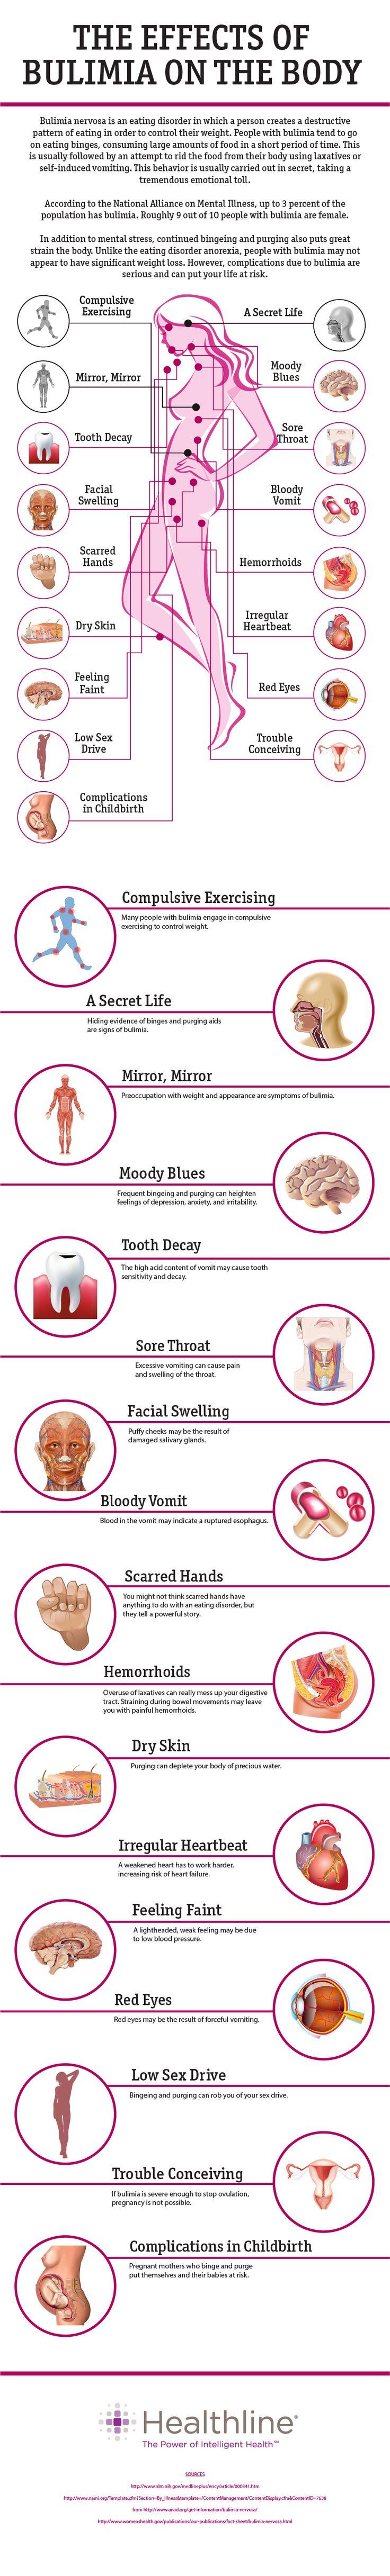 Bulimia nervosa effects